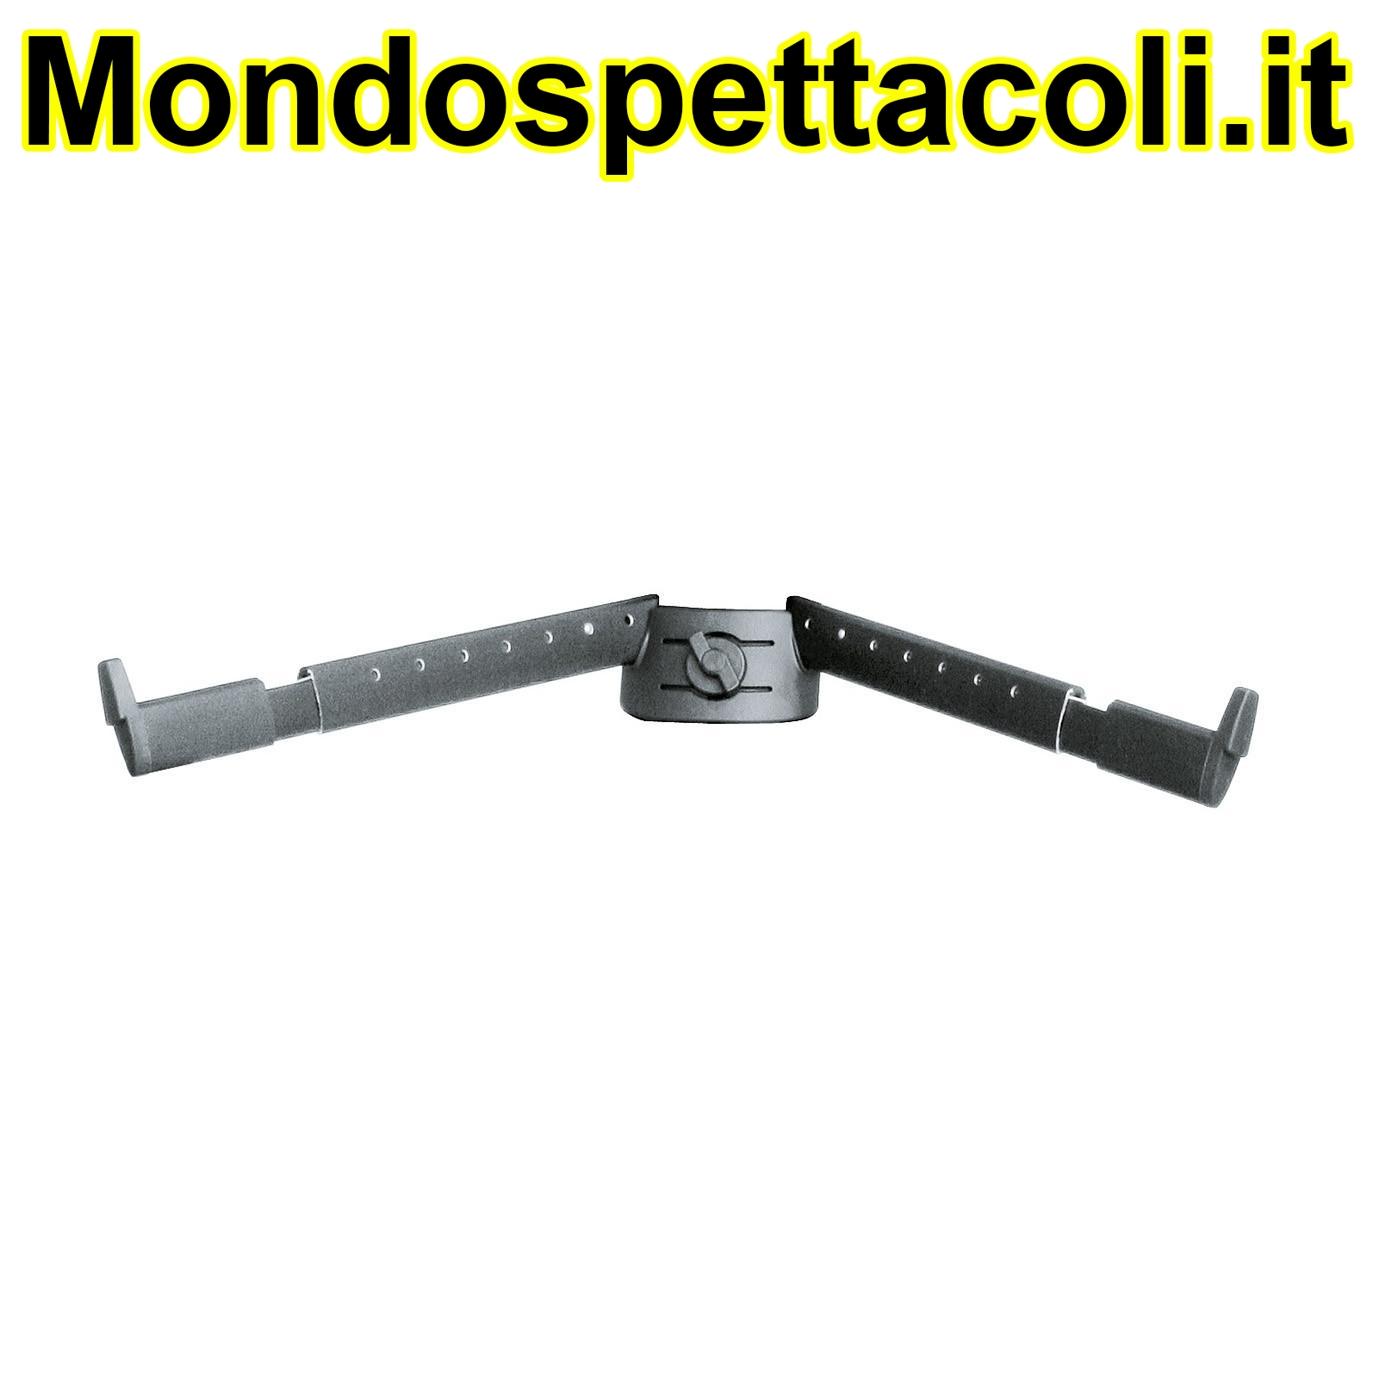 K&M black anodized Support arm set B 18866-000-35